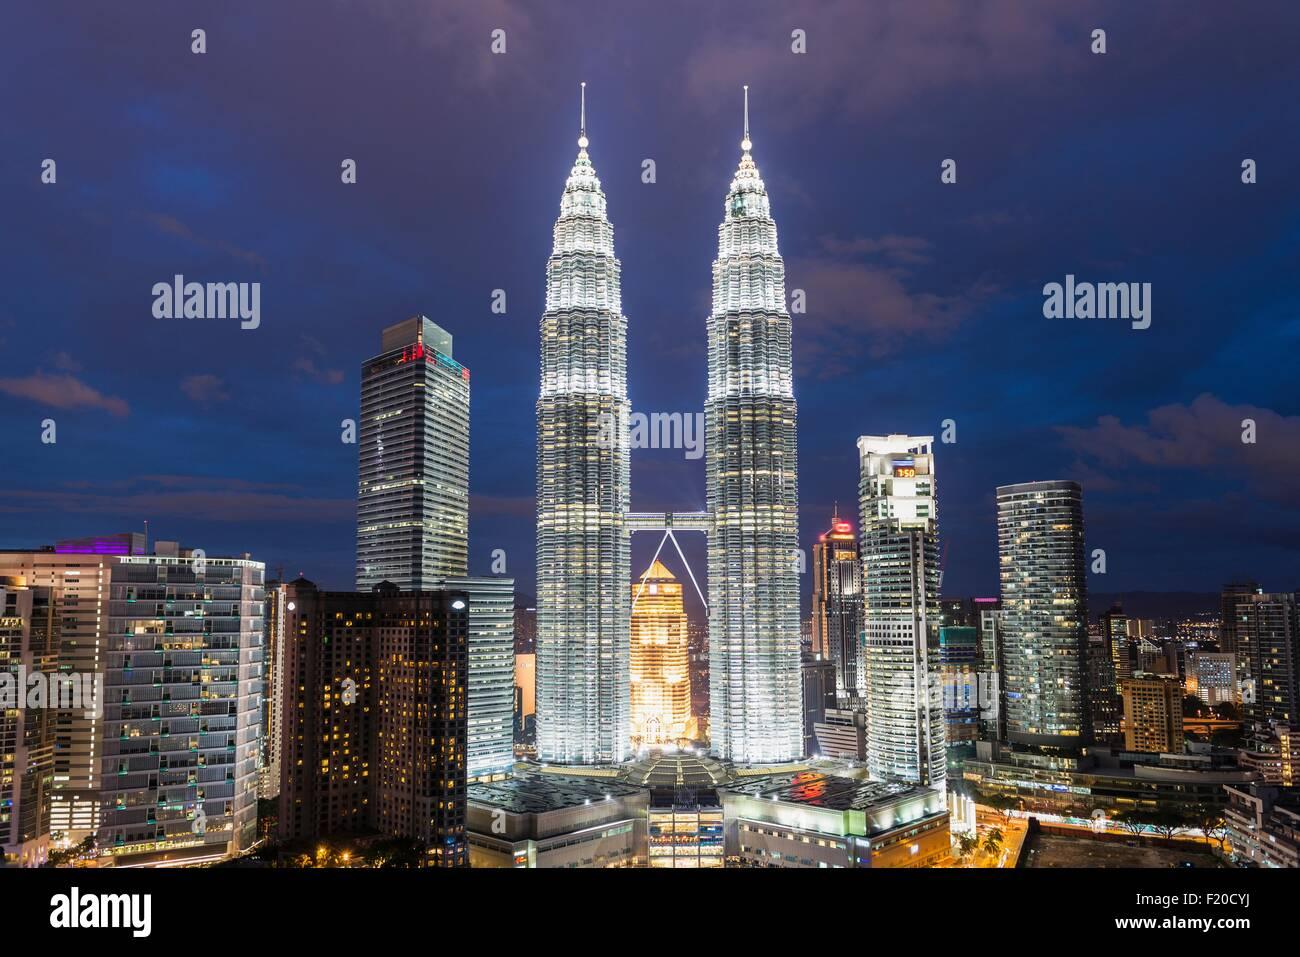 Petronas Towers illuminata di notte, Kuala Lumpur, Malesia Immagini Stock